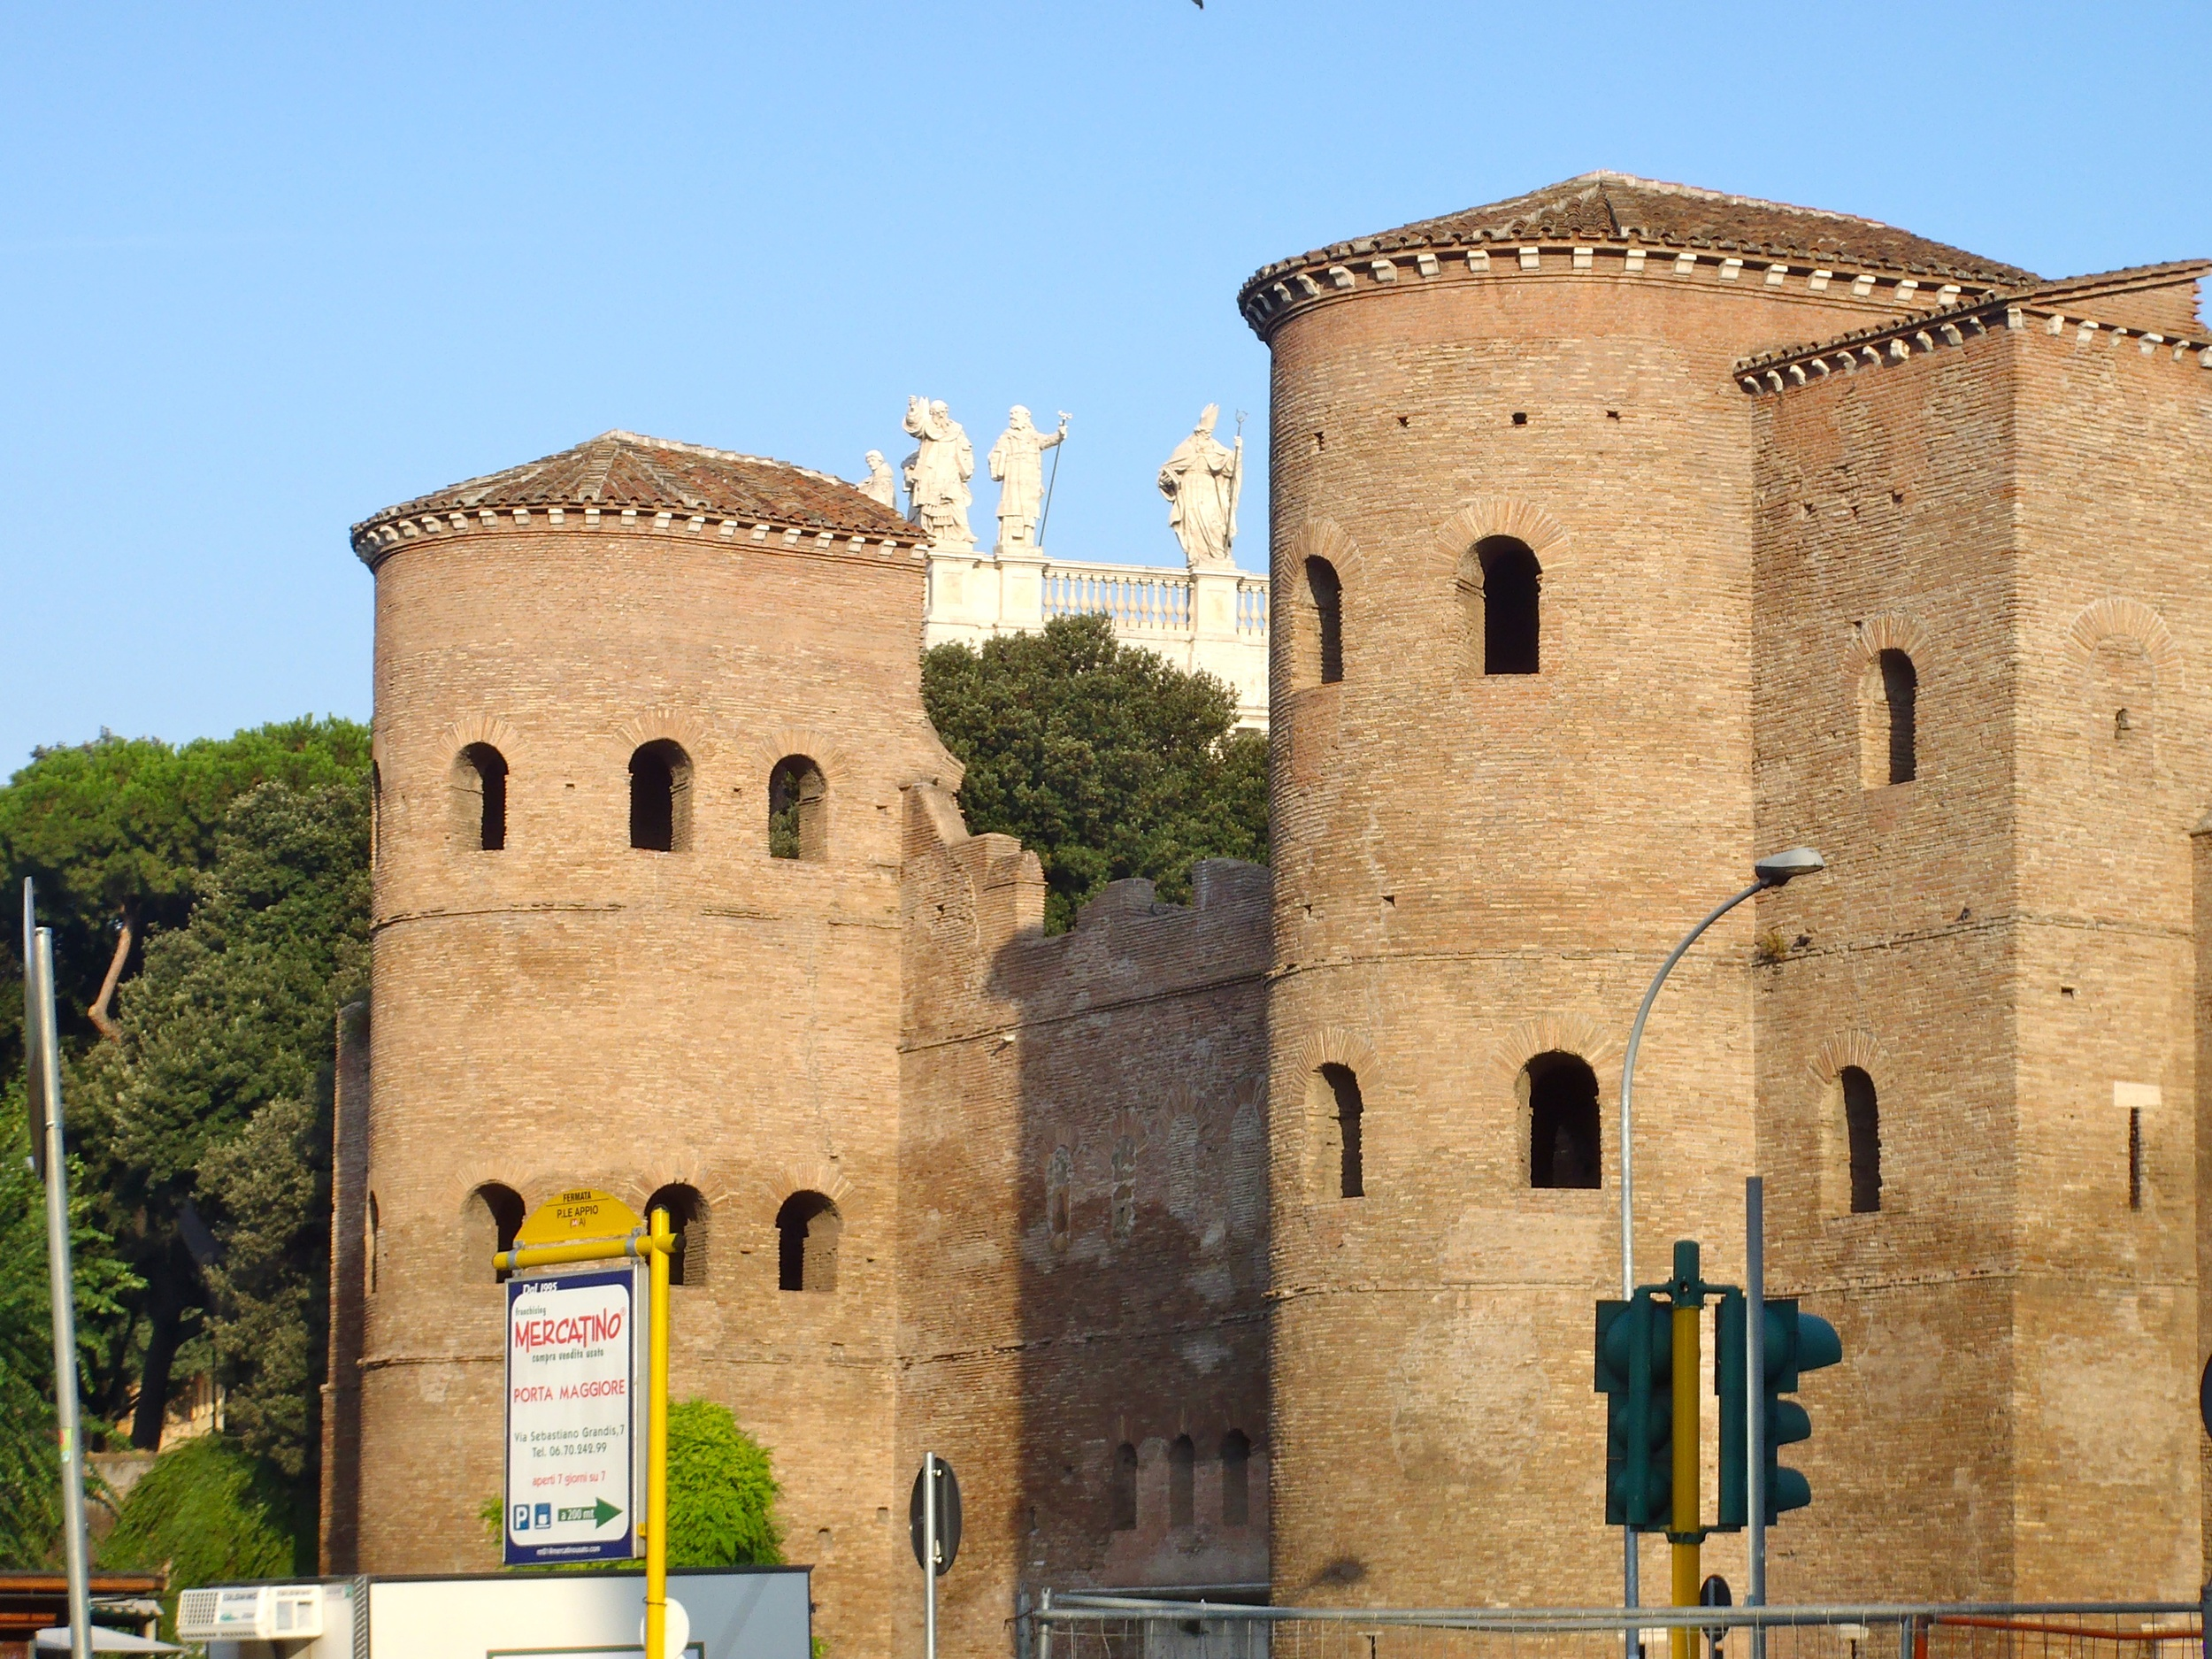 CRO Italy web 2012 - 54.jpg